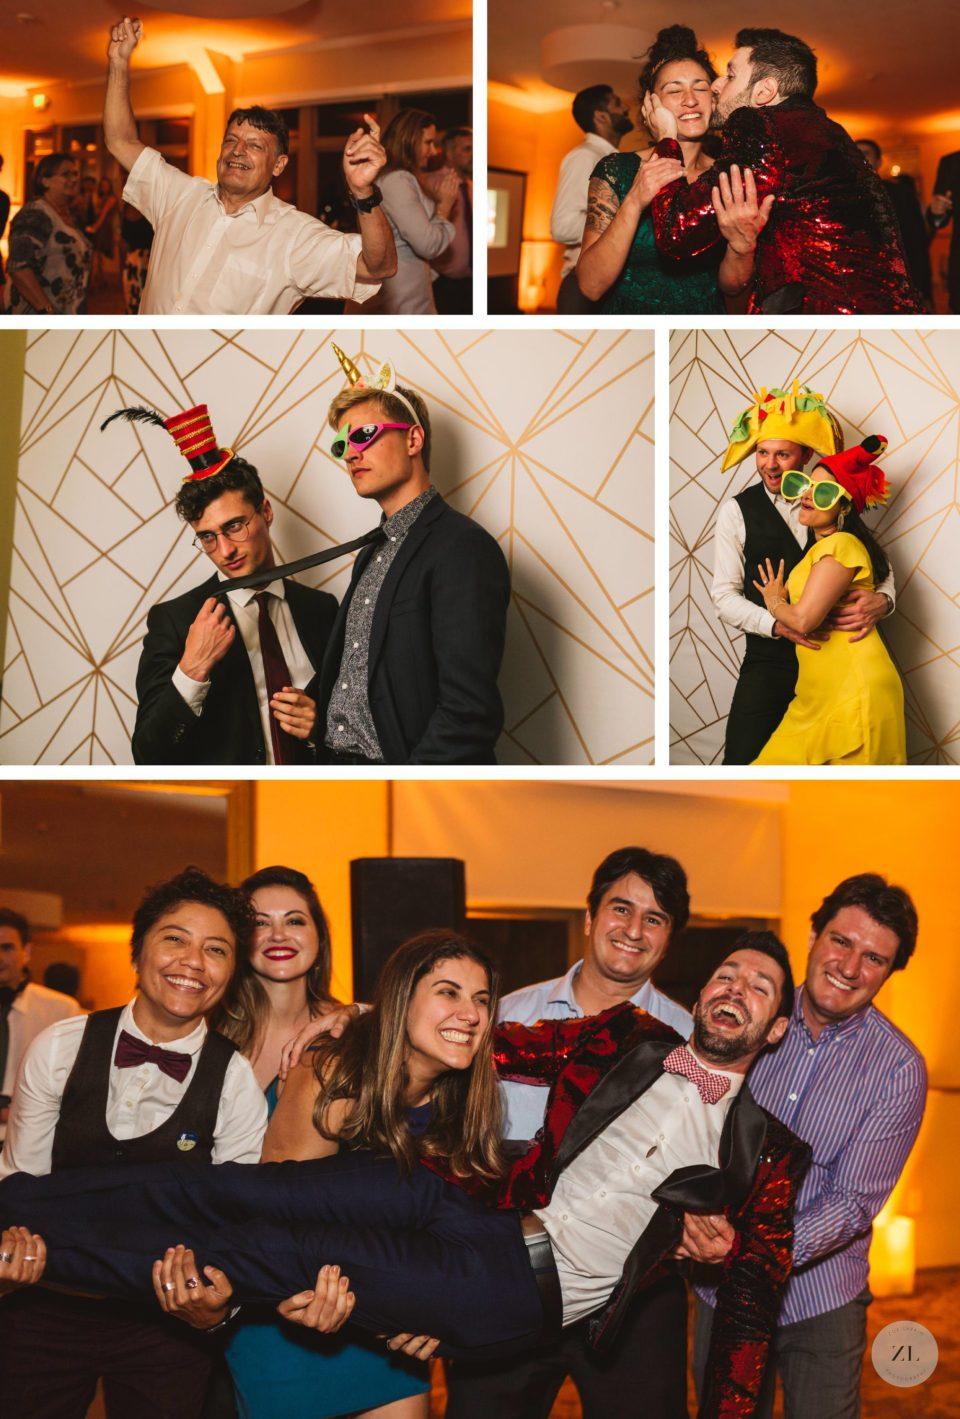 General's Residence at Fort Mason wedding photos - guests having fun